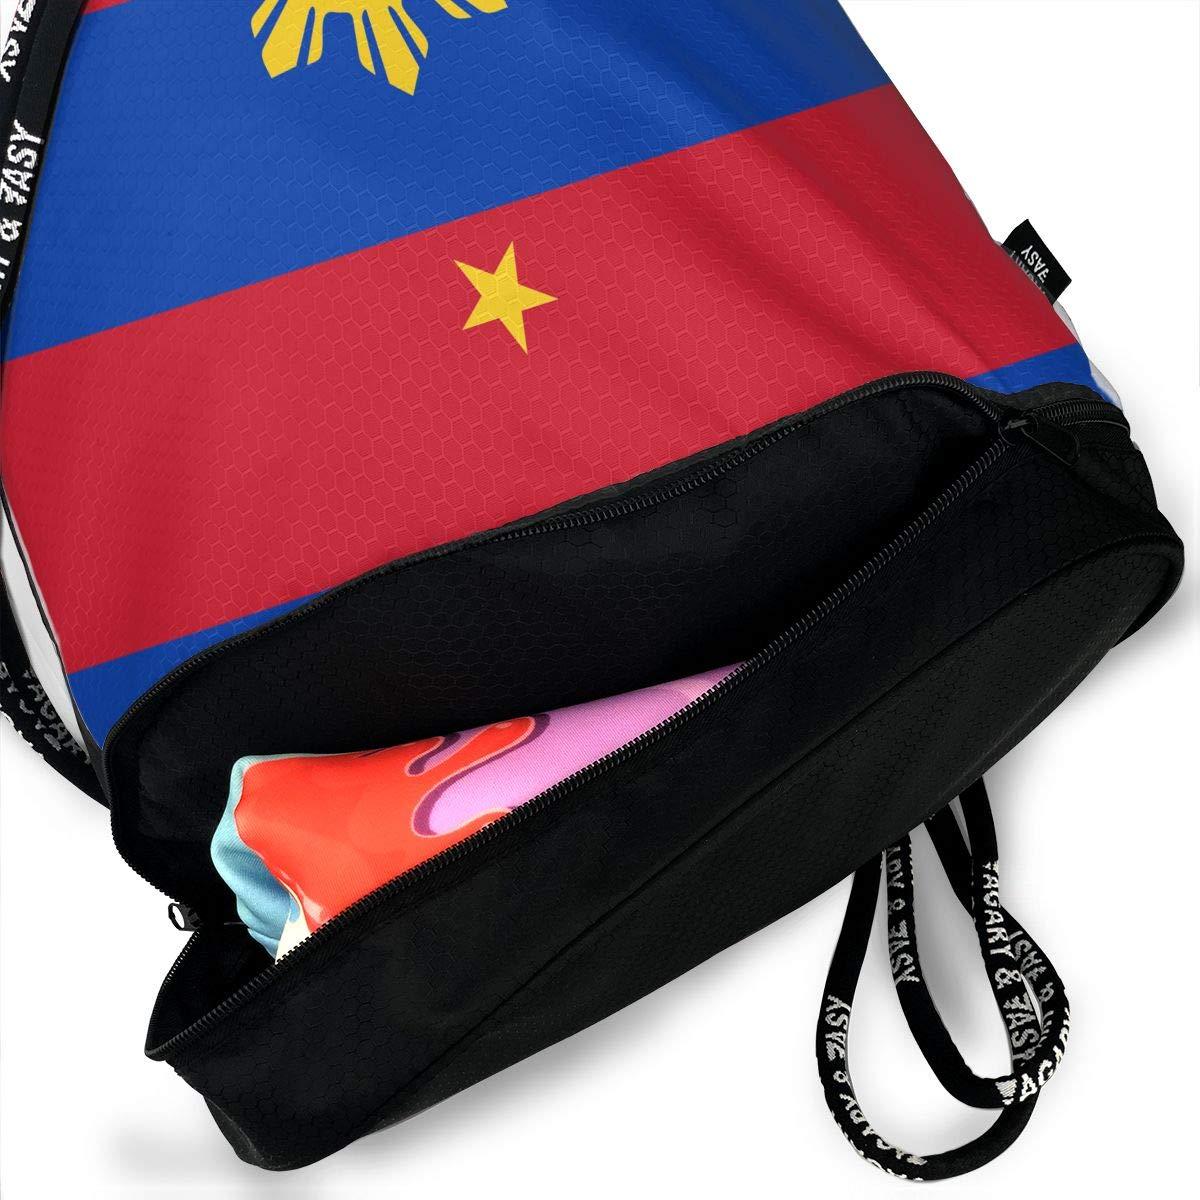 7cdcc3d586c1 Amazon.com  Originality Philippines Flag Drawstring Bag Rucksack Shoulder  Bags Travel Sport Gym Bag Print - Yoga Runner Daypack Shoe Bags with Zipper  and ...